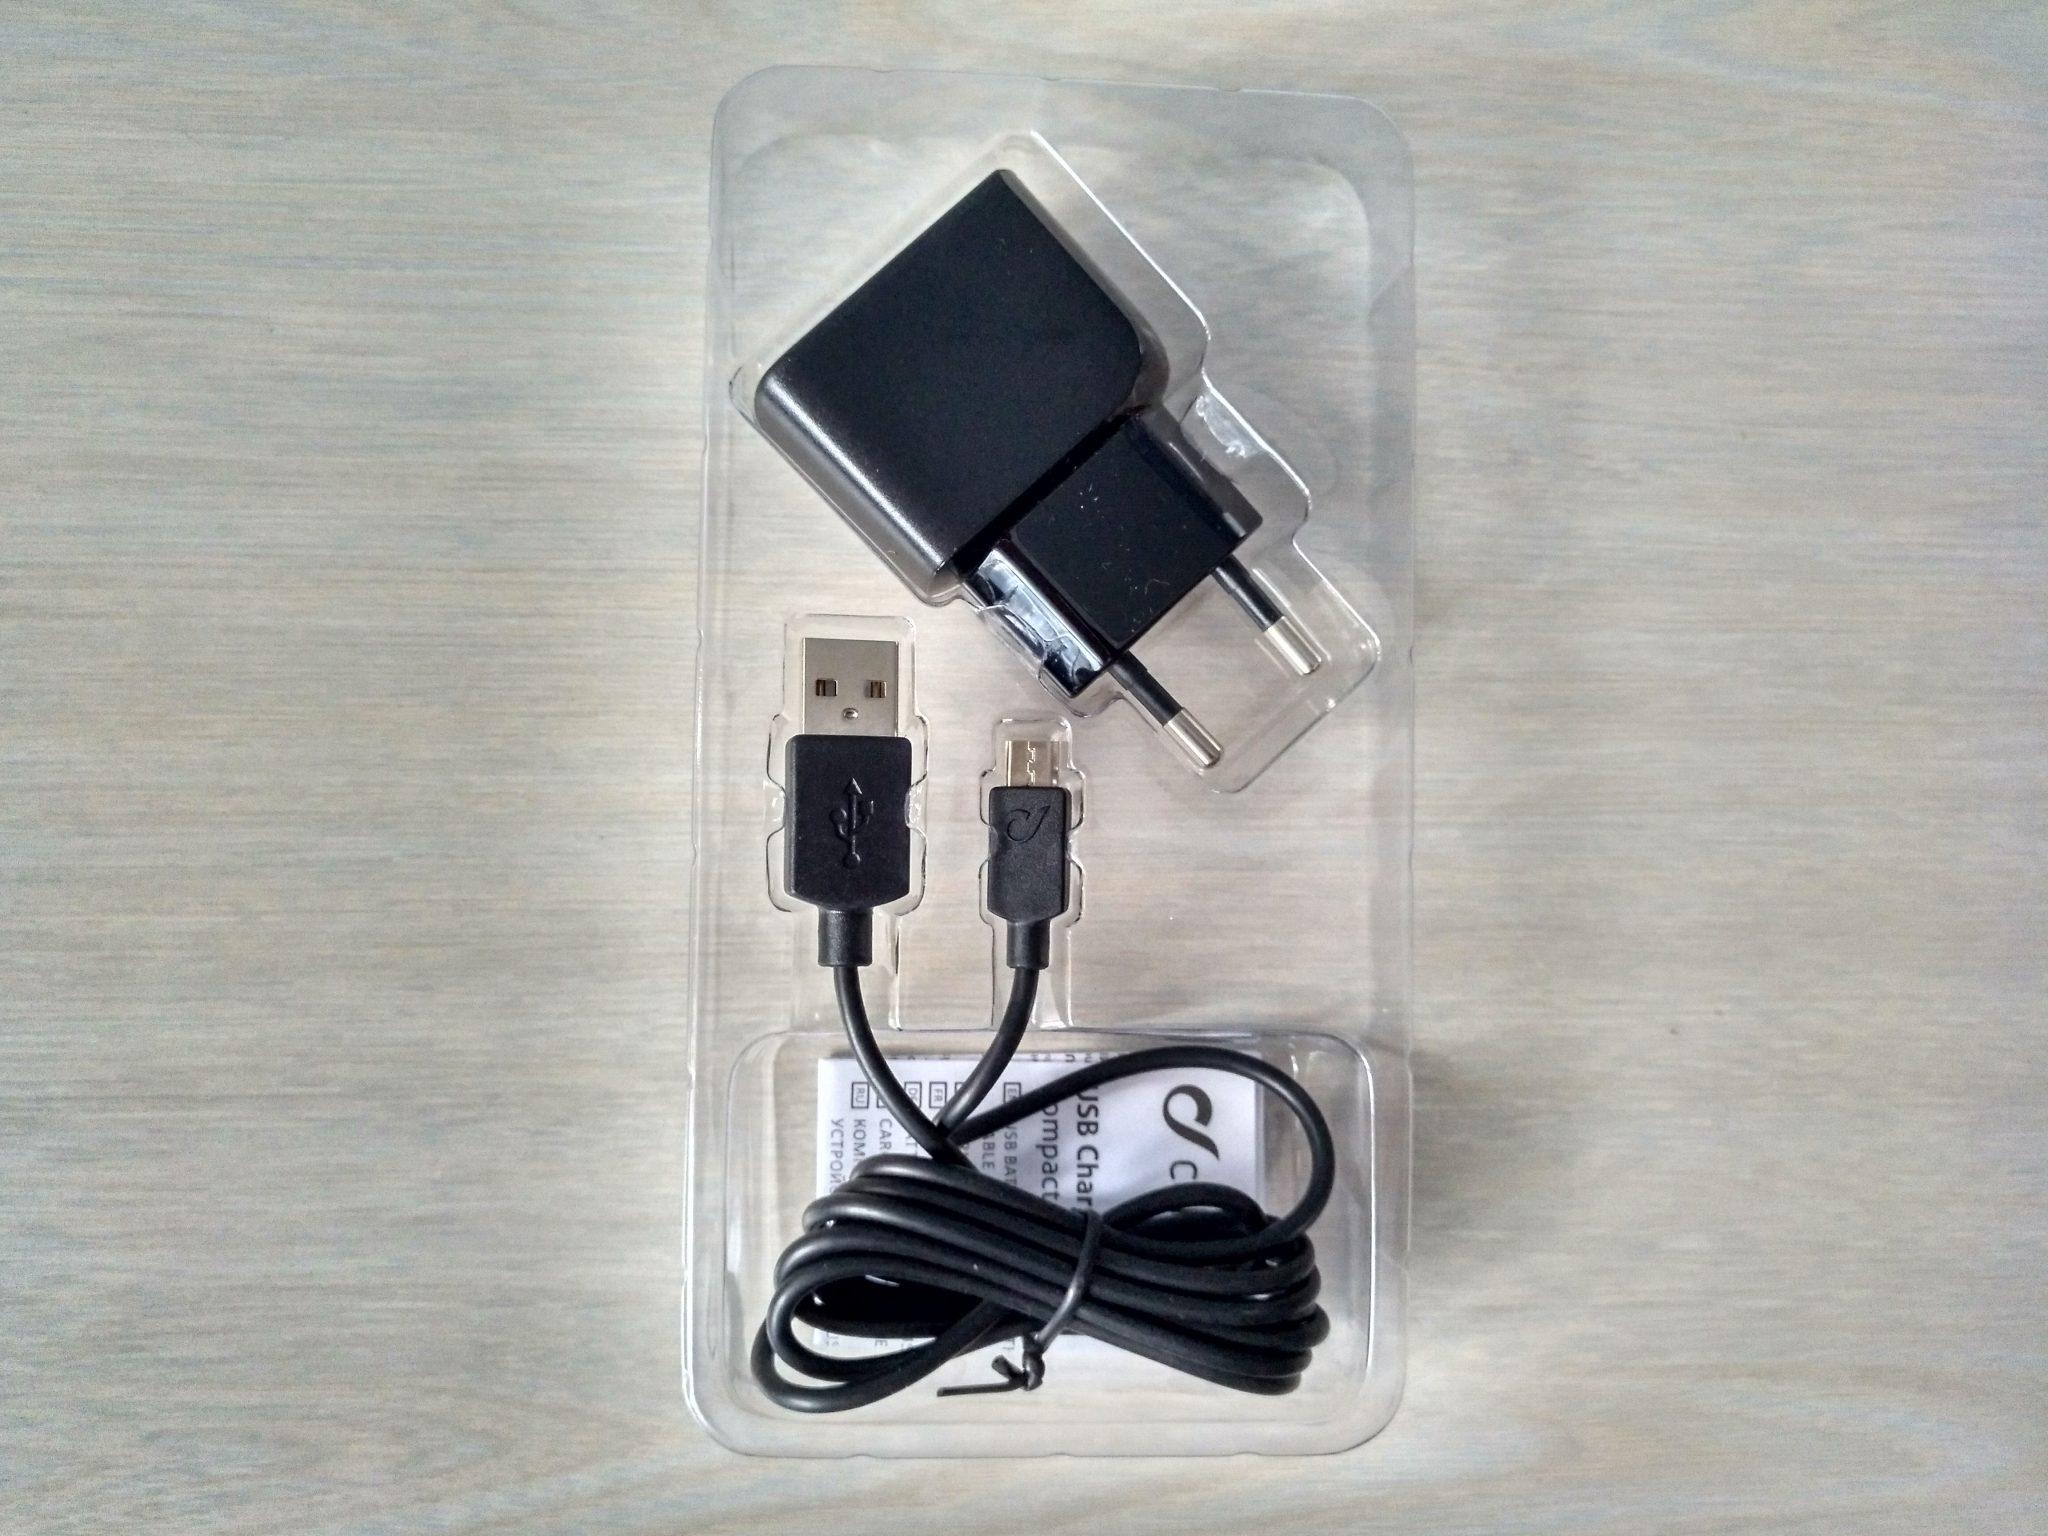 Cellularline Kit de cargador USB 1A Review en español